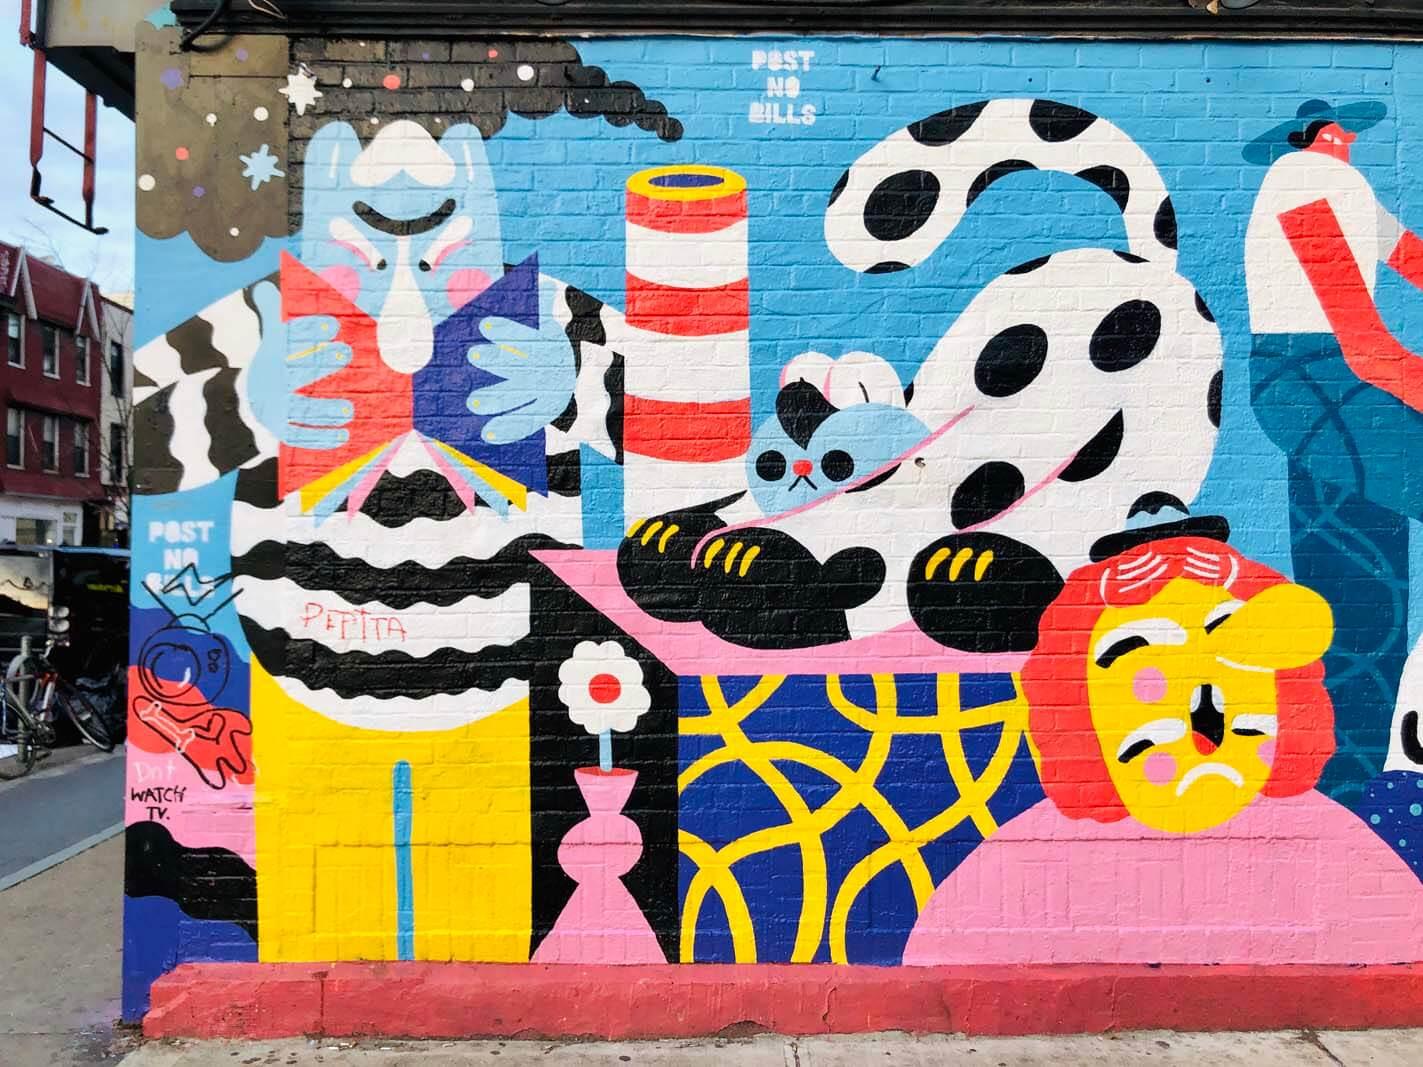 Fun Mural by Brolga in Williamsburg Brooklyn